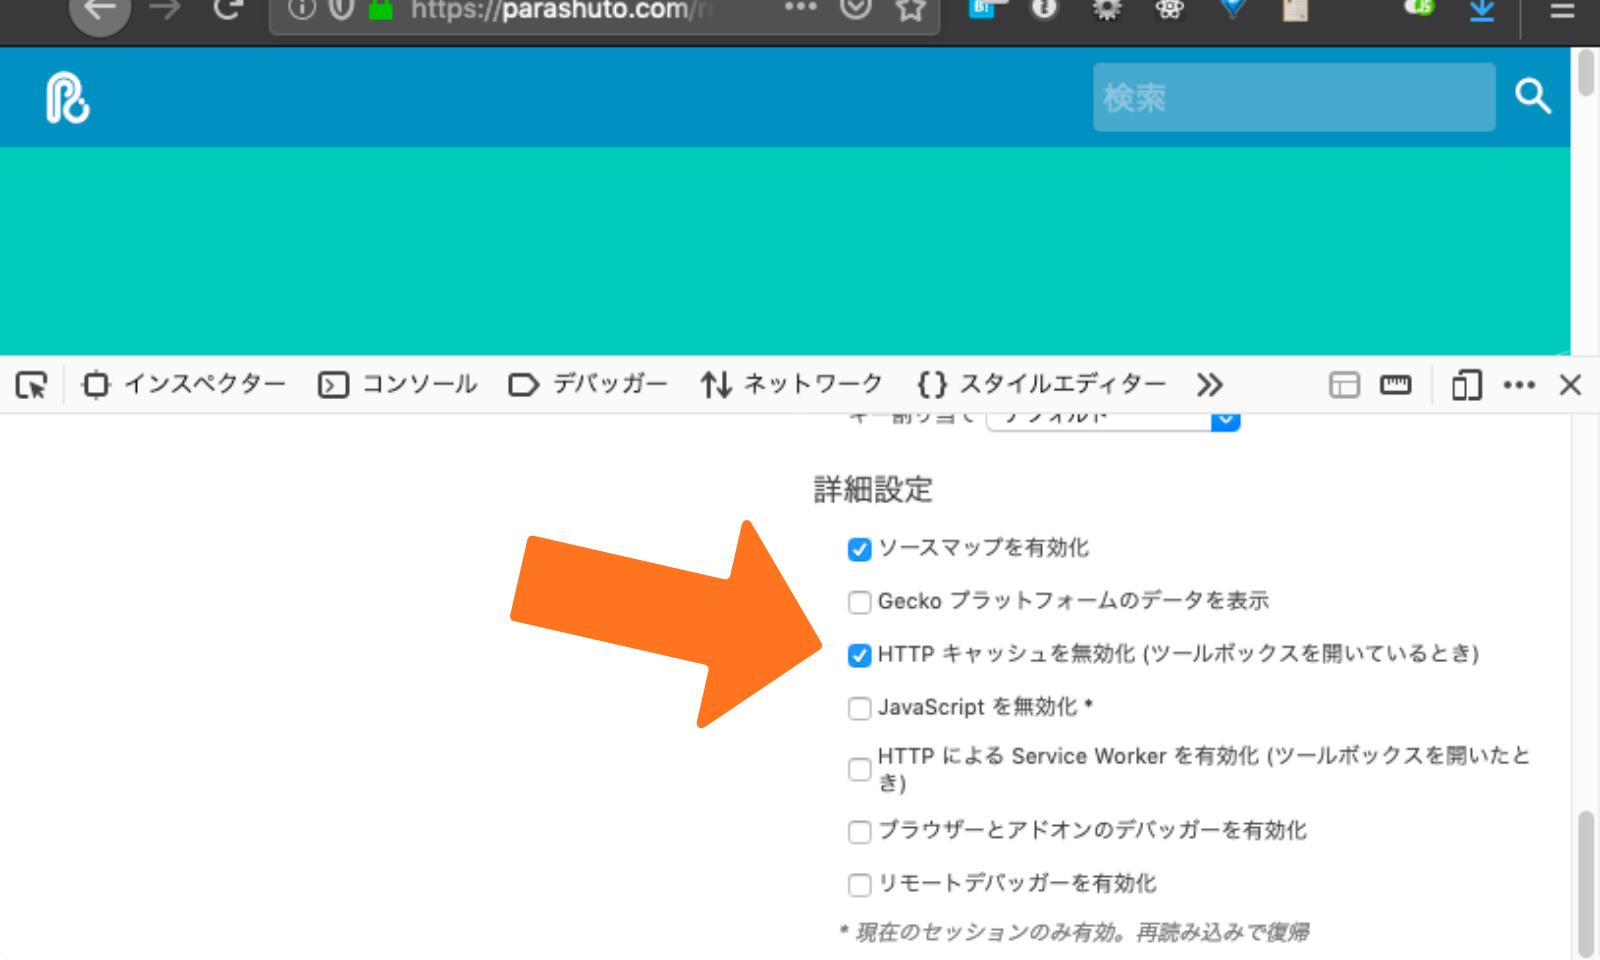 Firefoxの開発ツールの設定画面。オレンジの矢印でオプションの表示場所が指し示されている